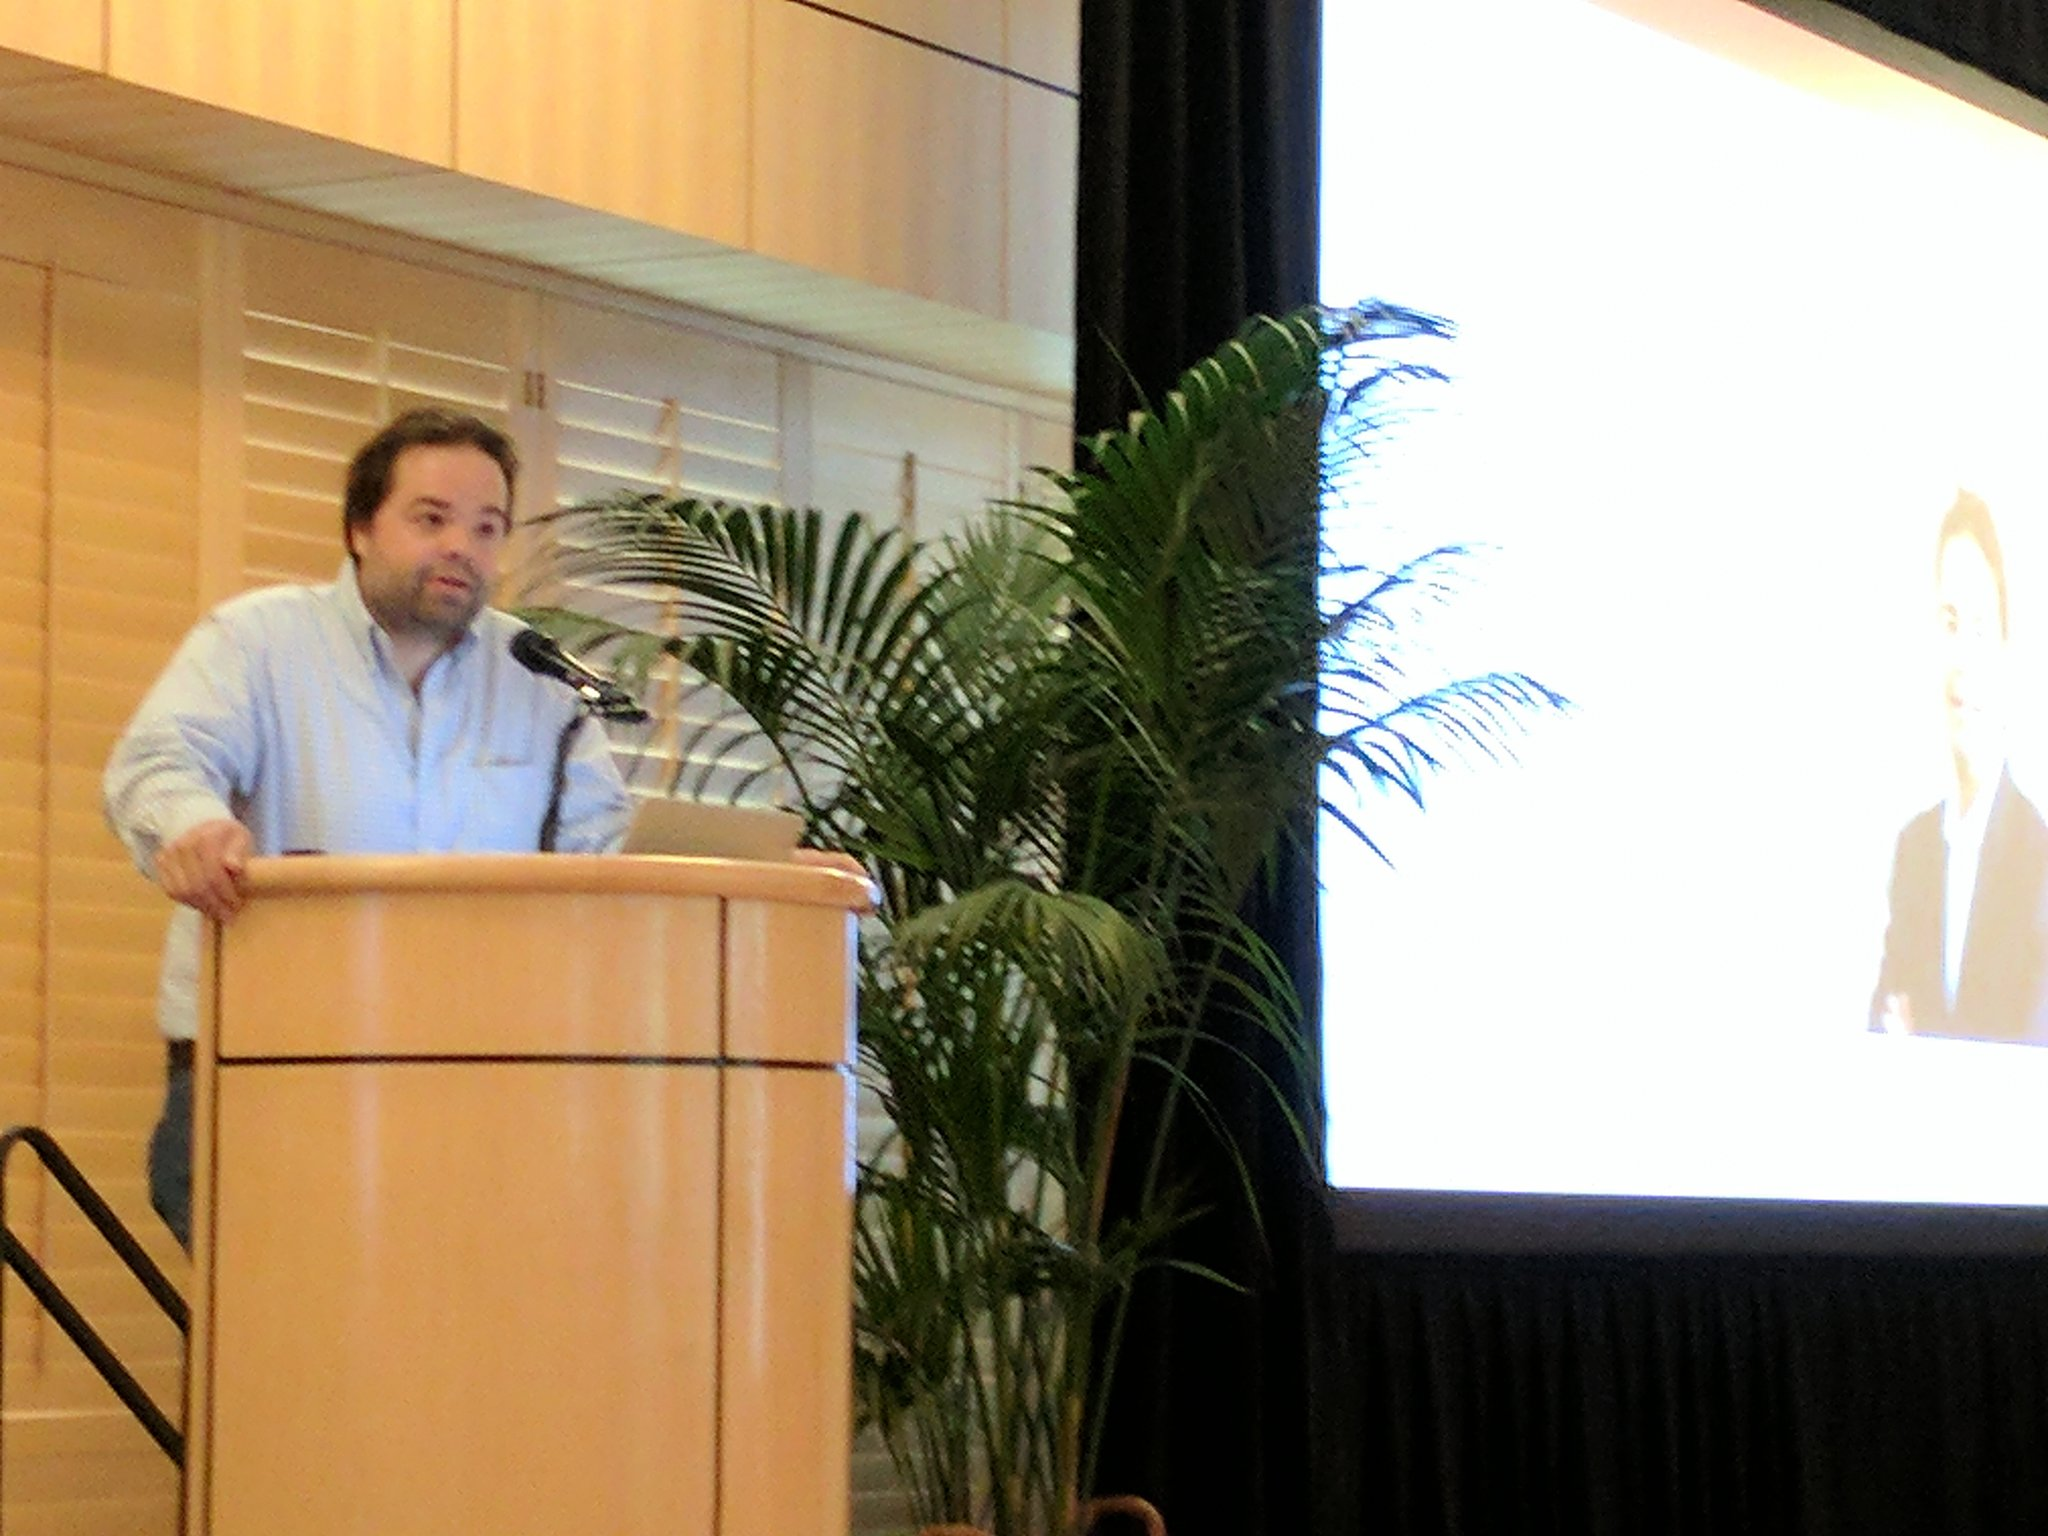 Prof @cdbustamante providing the opening statement @StanfordCEHG #CEHG17 https://t.co/dBbZfcnFli